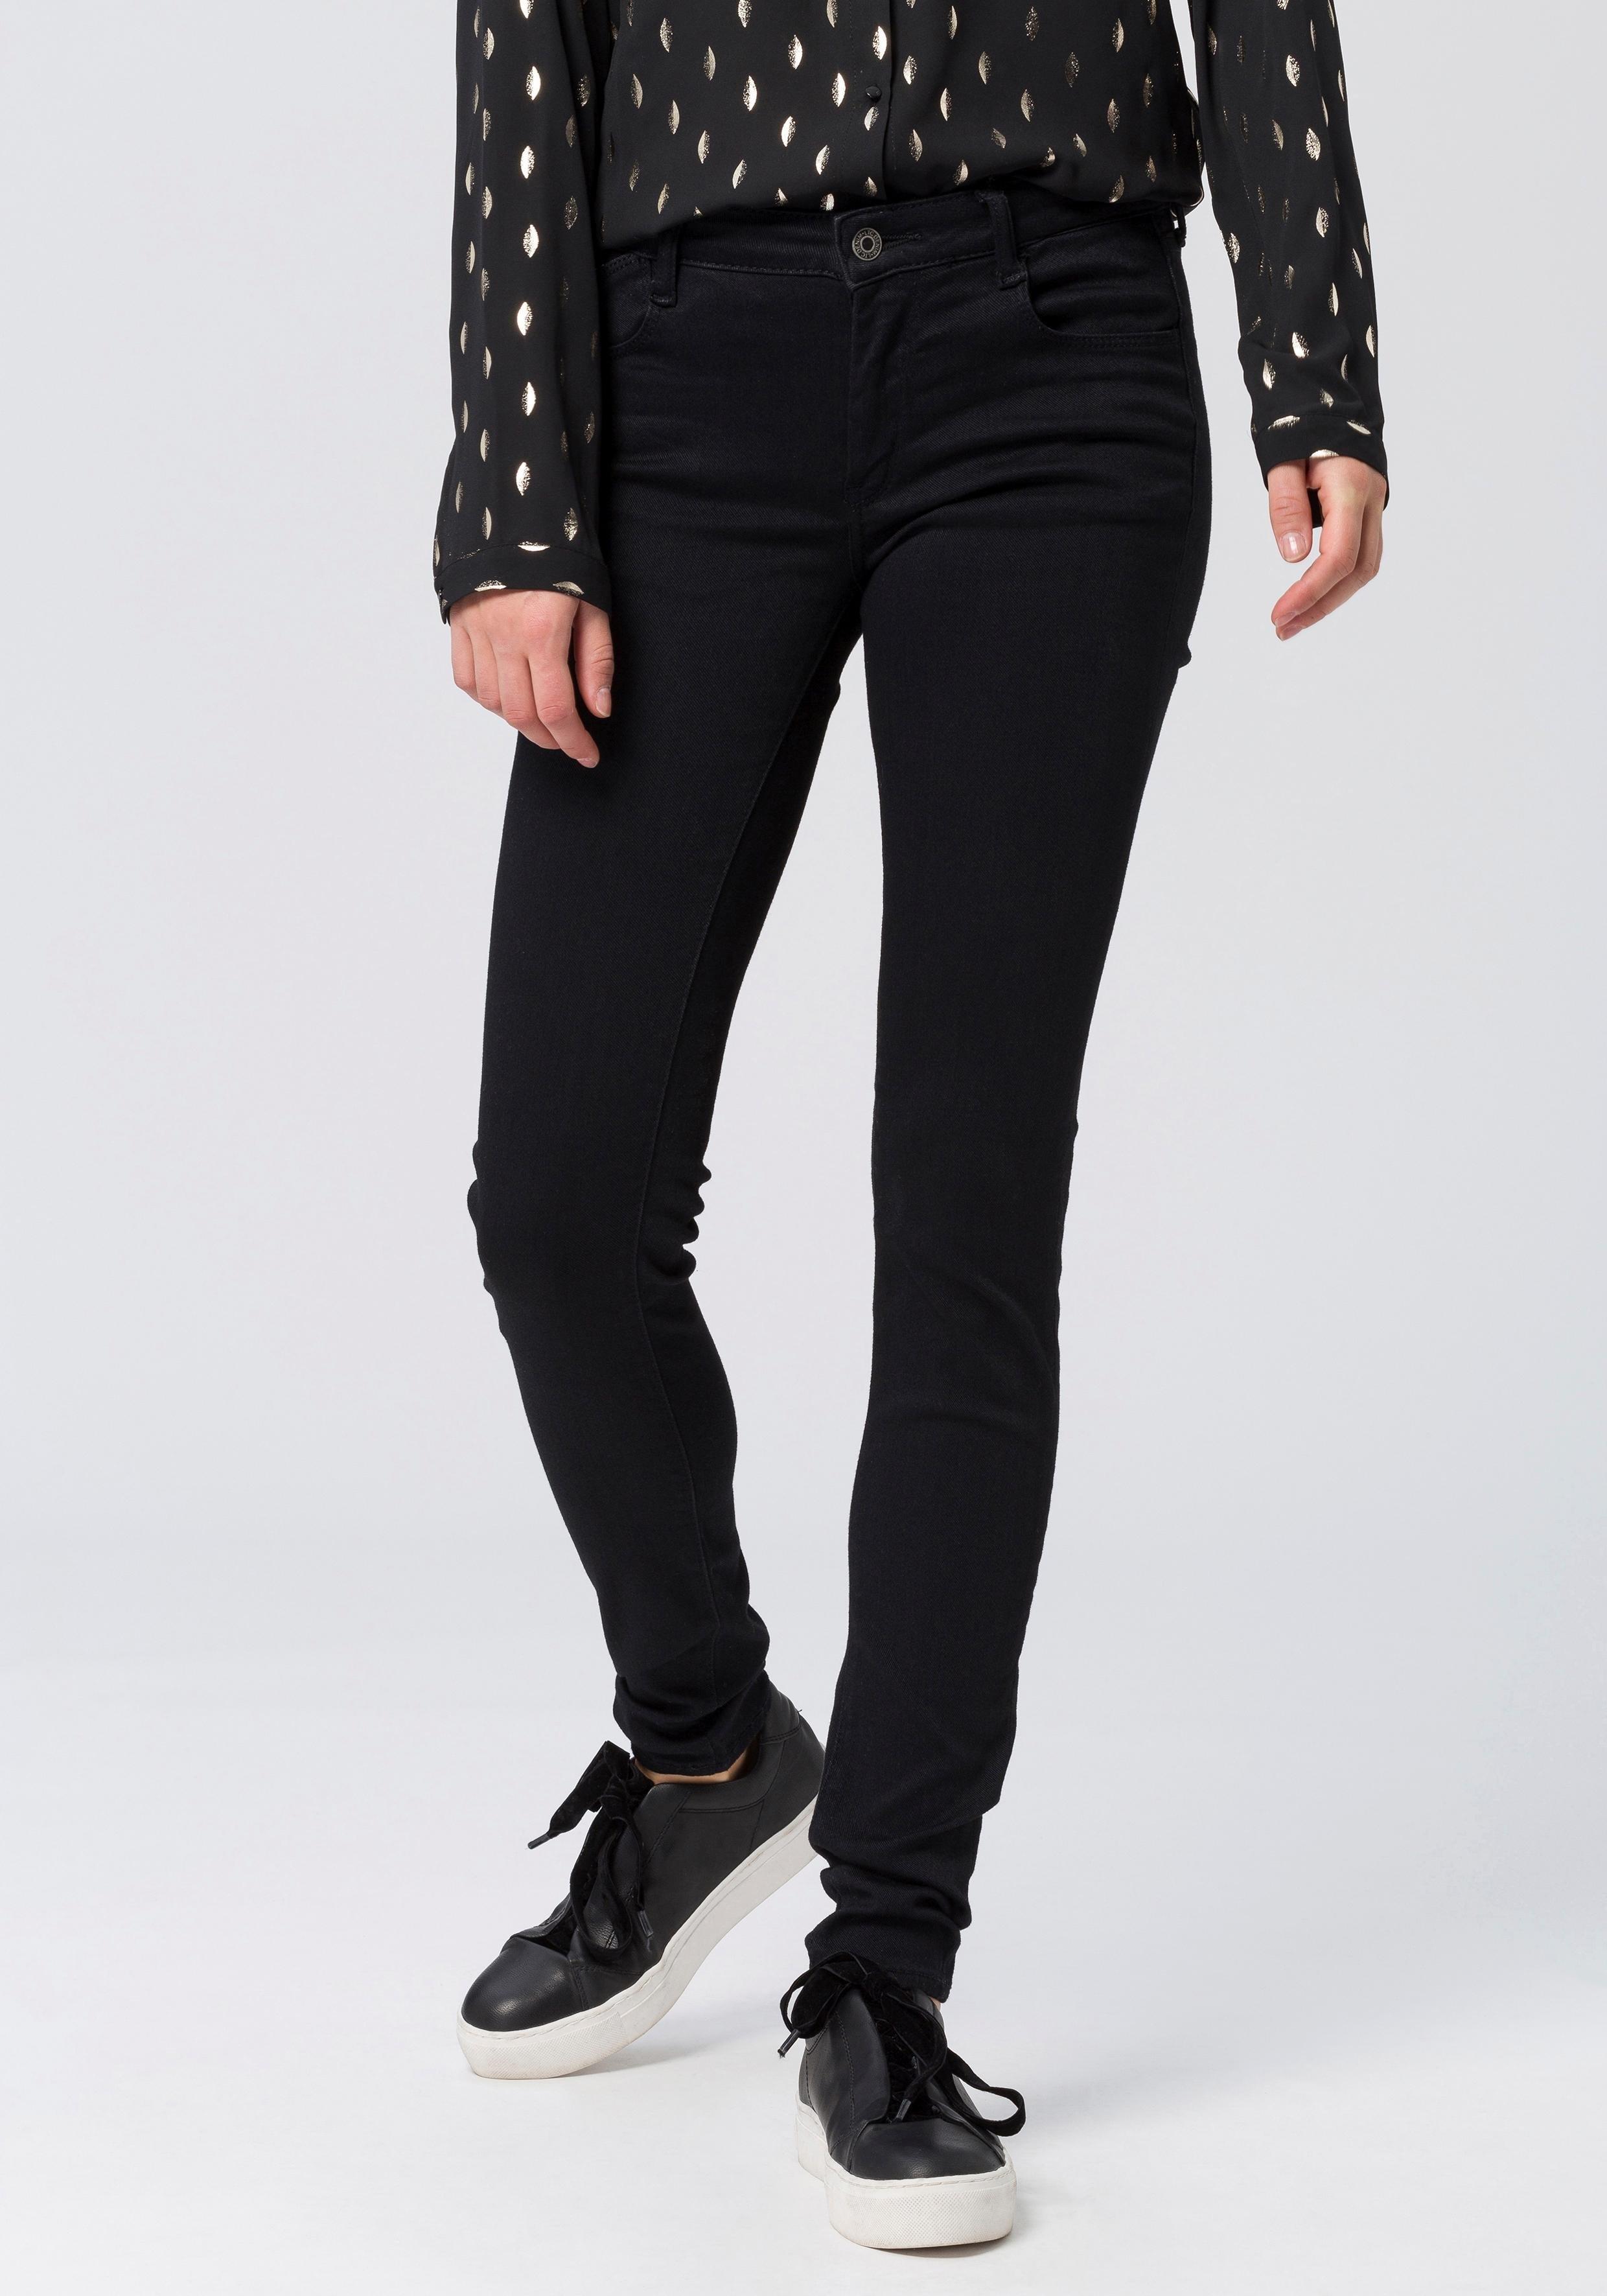 Jeansultrapower Bij Des Cerises Skinny Fit Vind Temps Le Je lJcu1KF3T